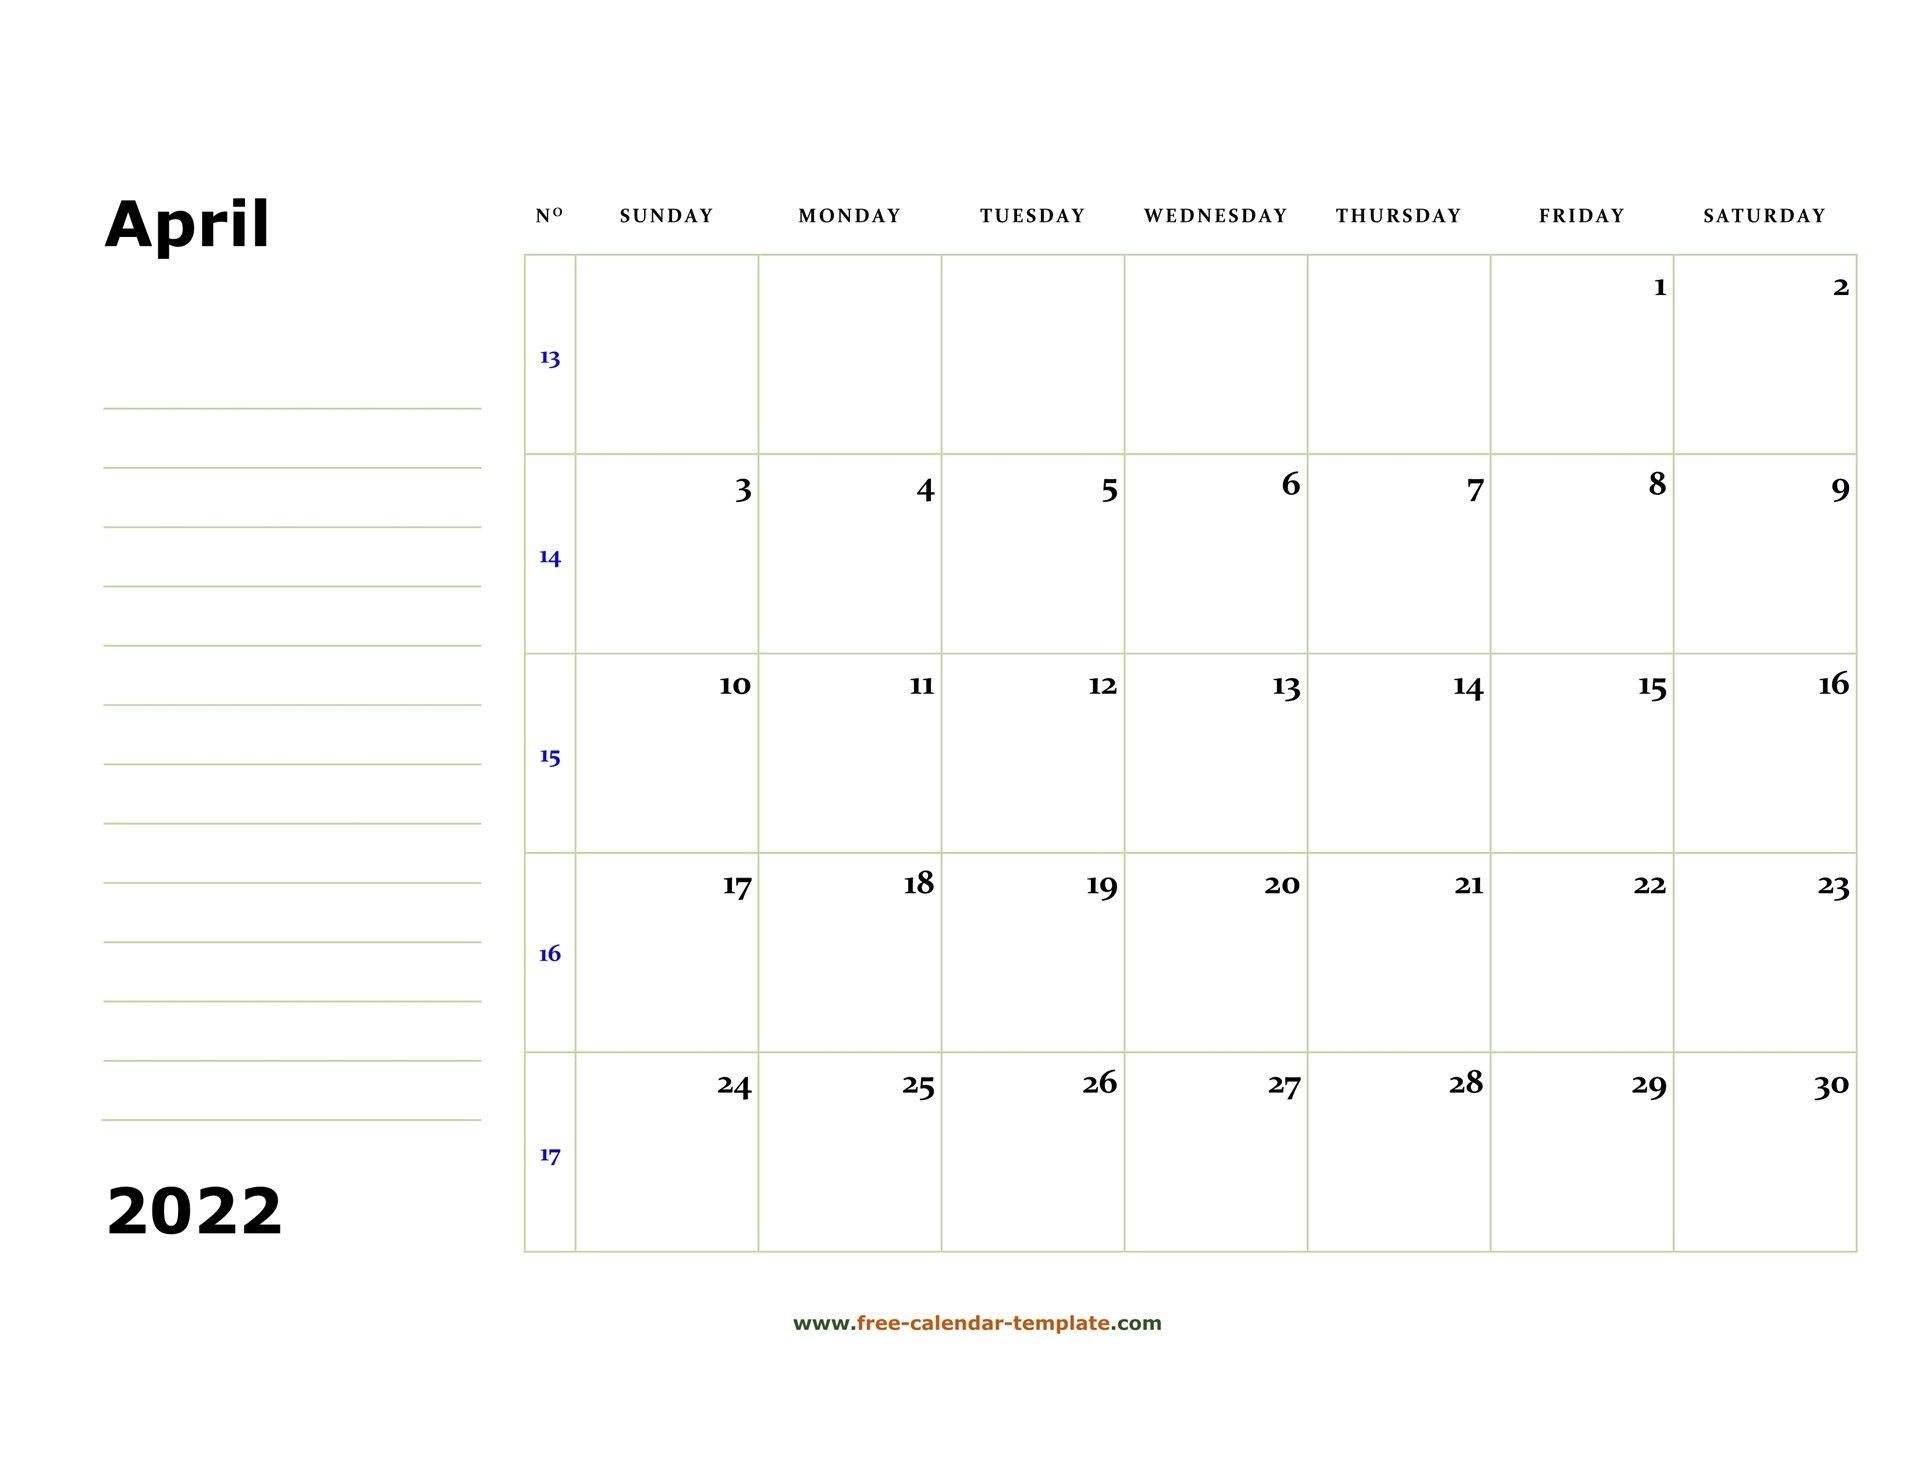 Printable April 2022 Calendar (Box And Lines For Notes within April And May 2022 Calendar Printable Photo